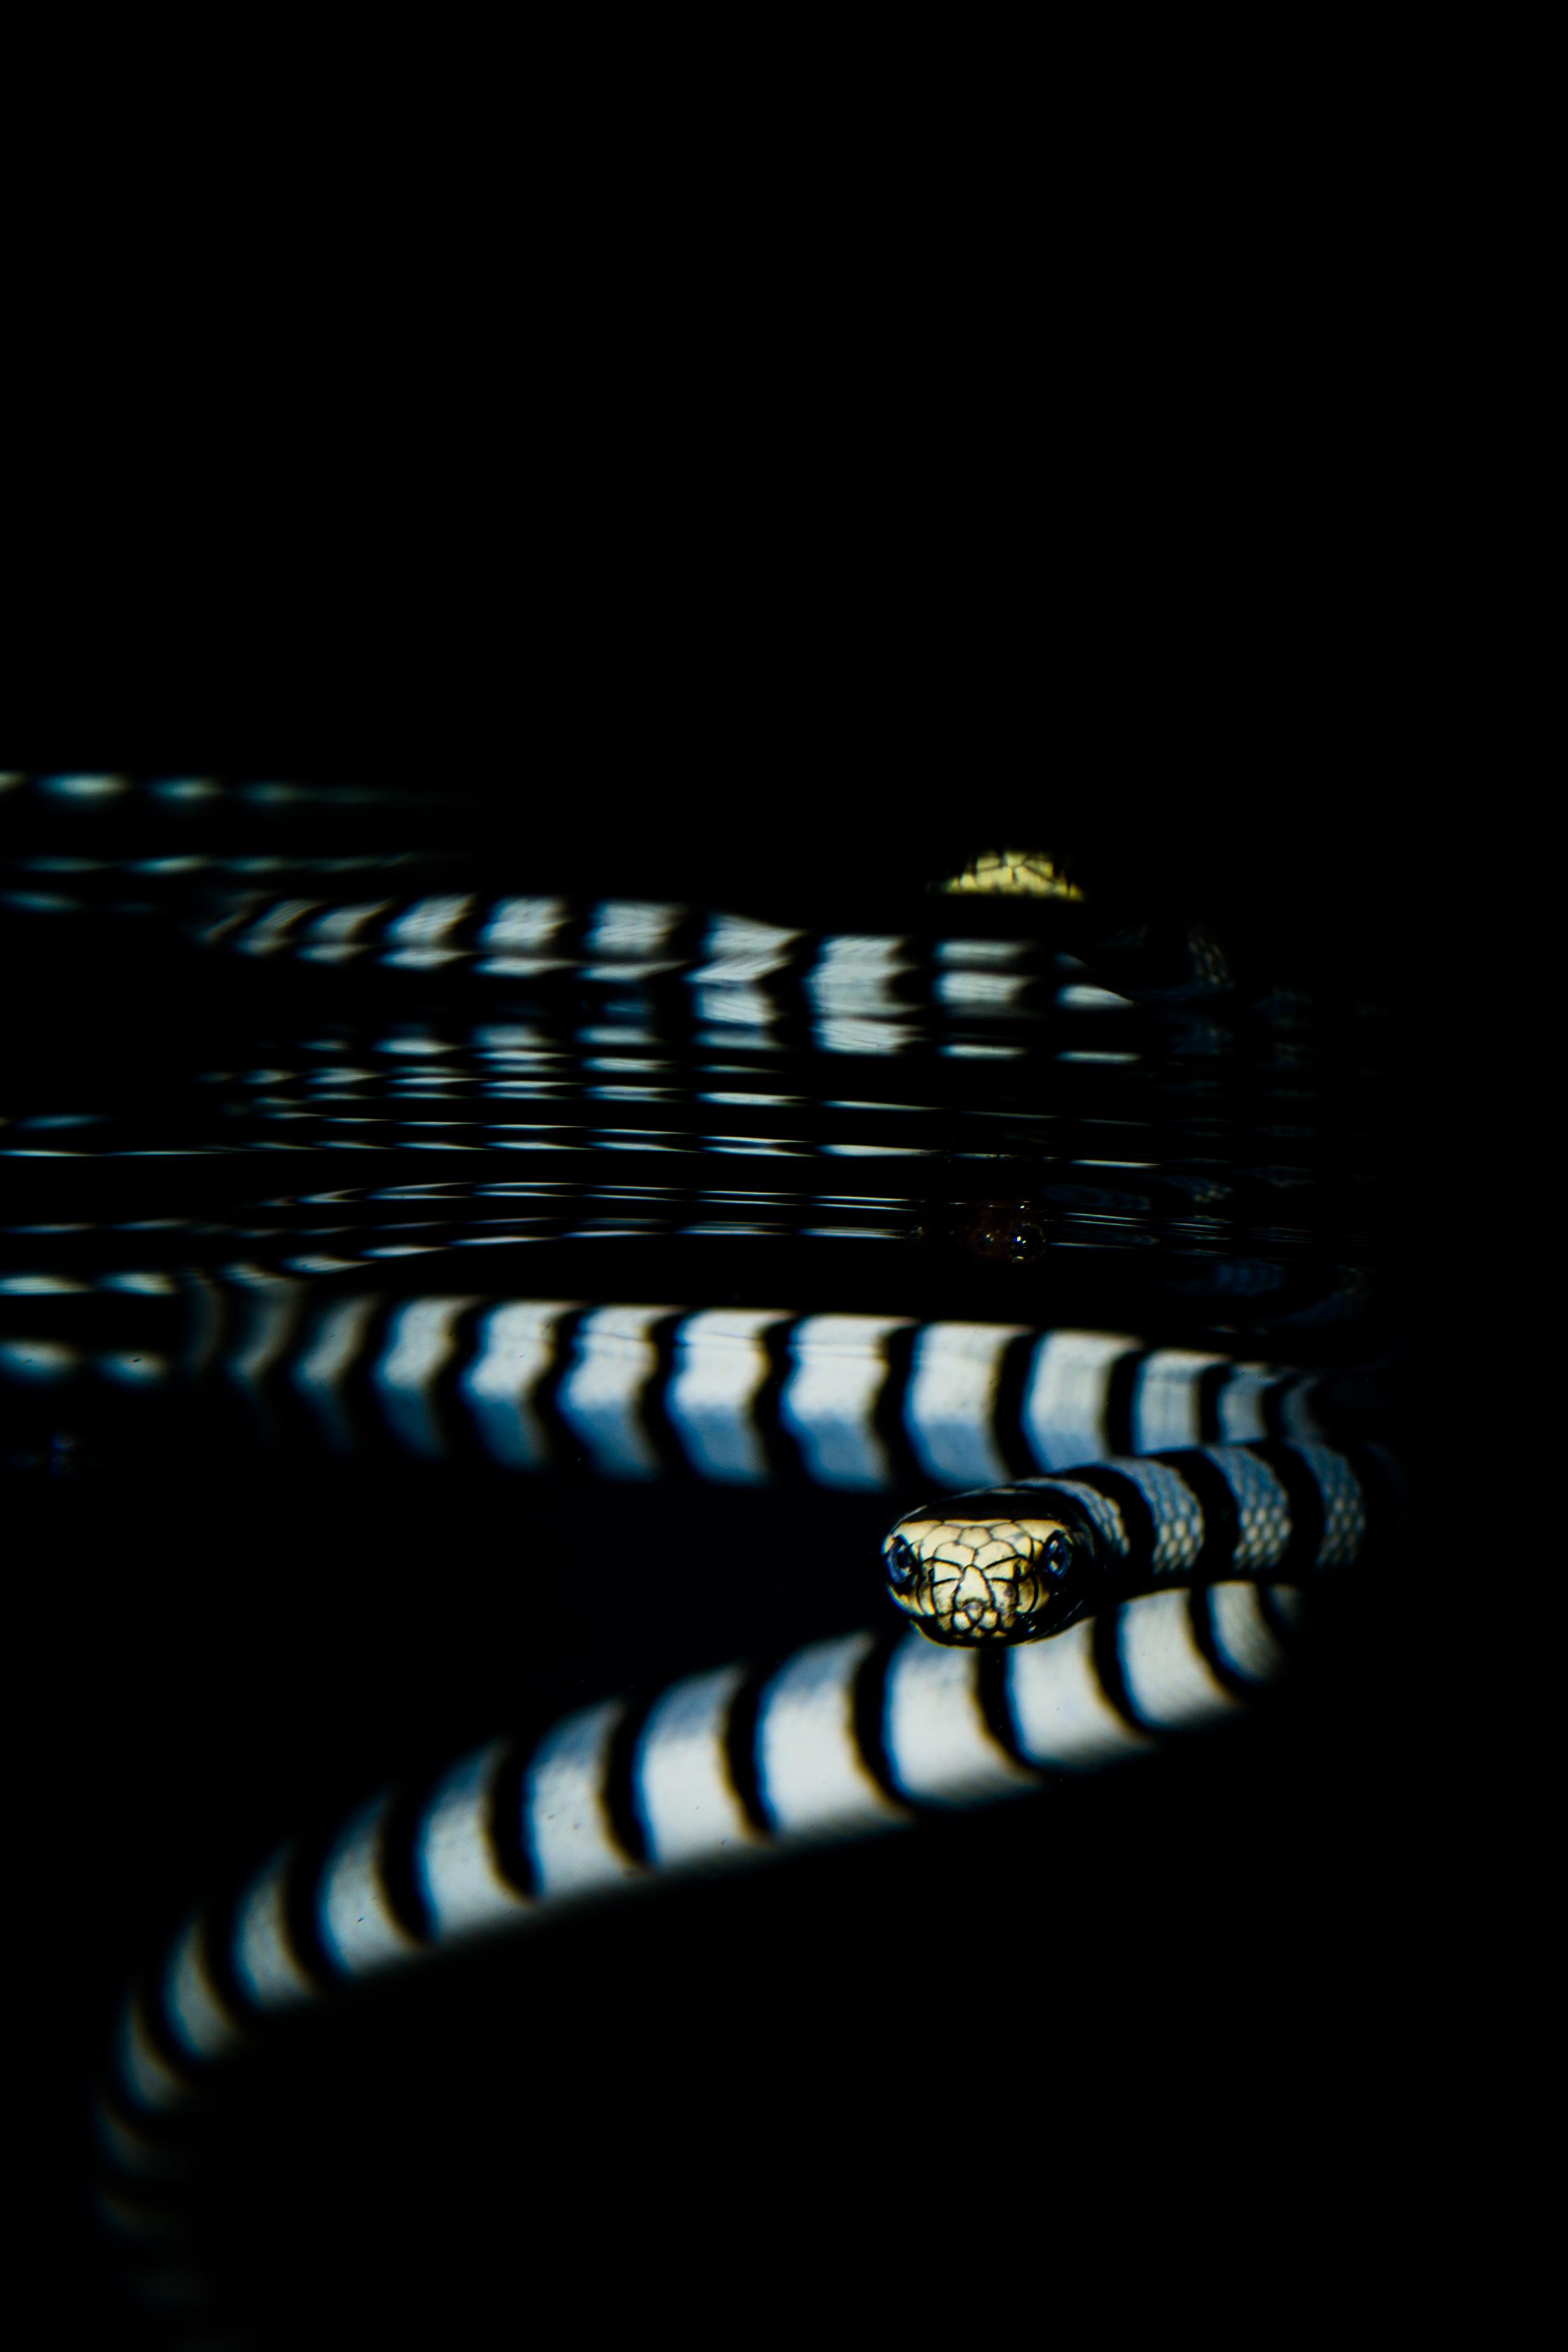 Sea krait staring